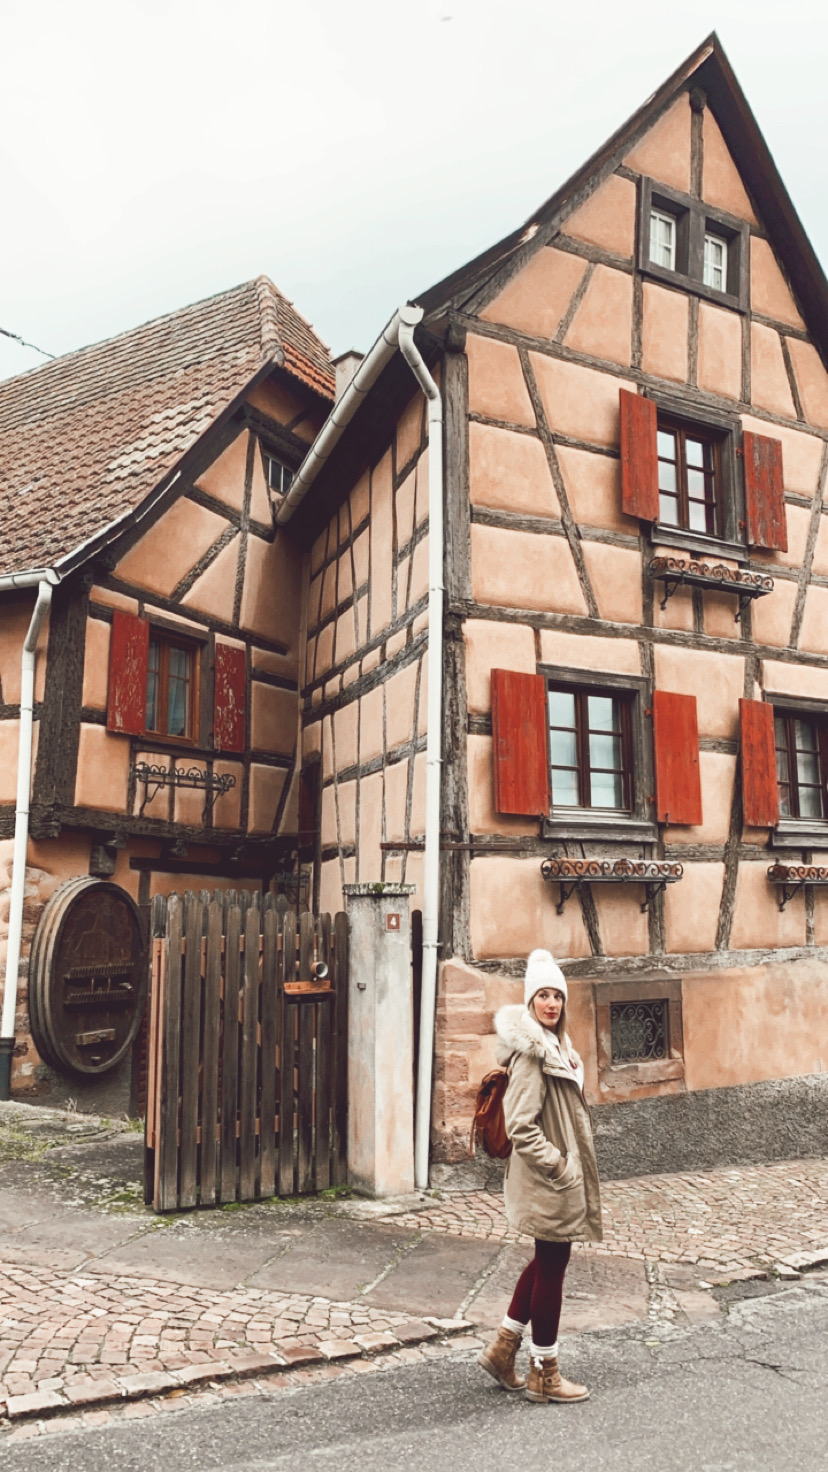 Hunawihr, Alsace